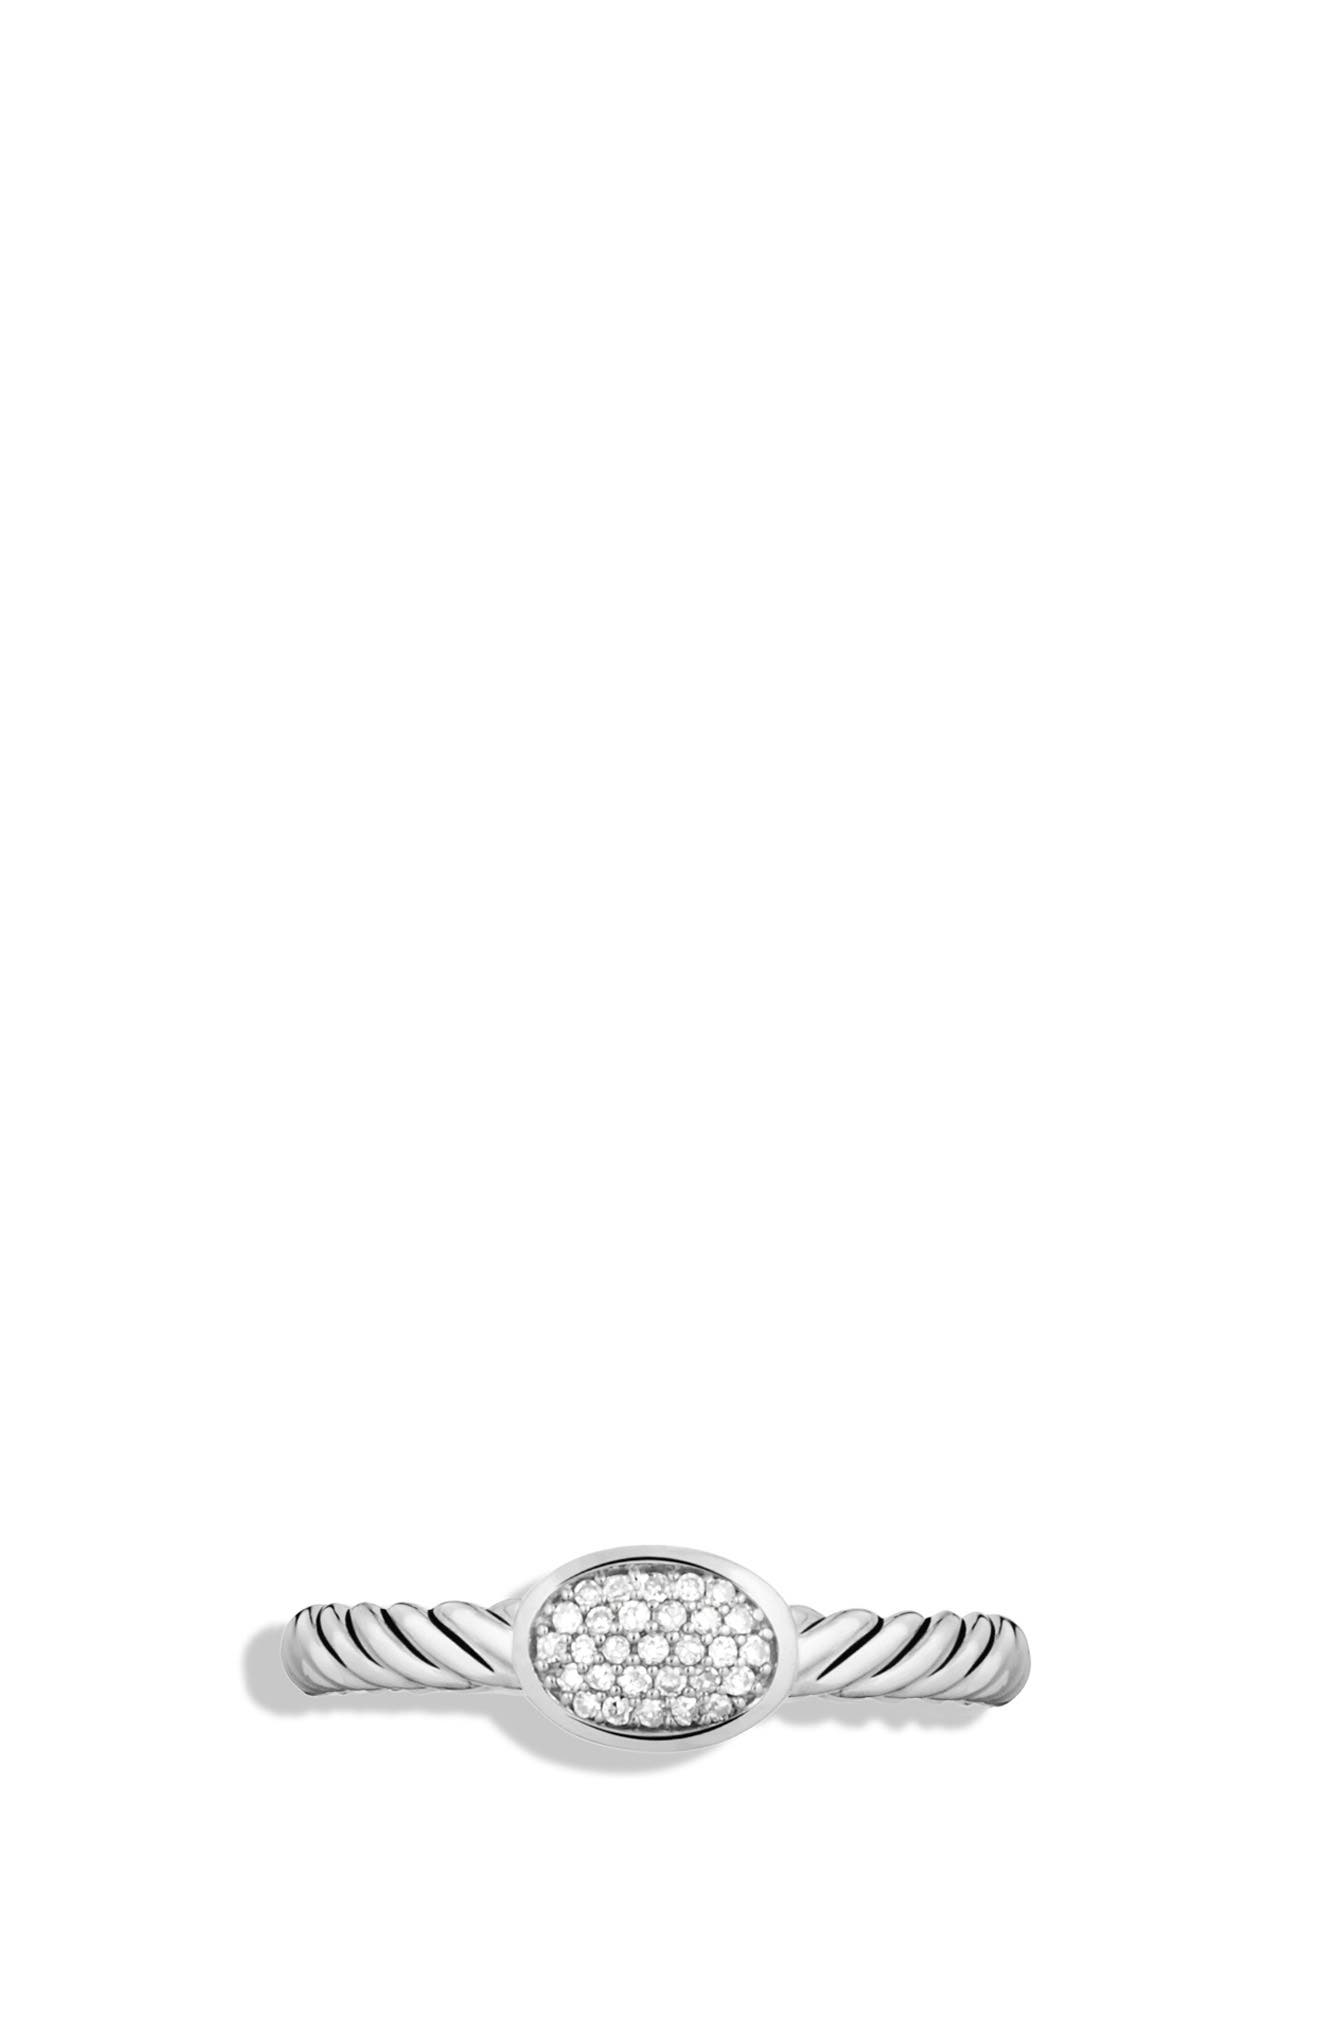 Petite Pavé Oval Ring with Diamonds,                             Alternate thumbnail 3, color,                             100